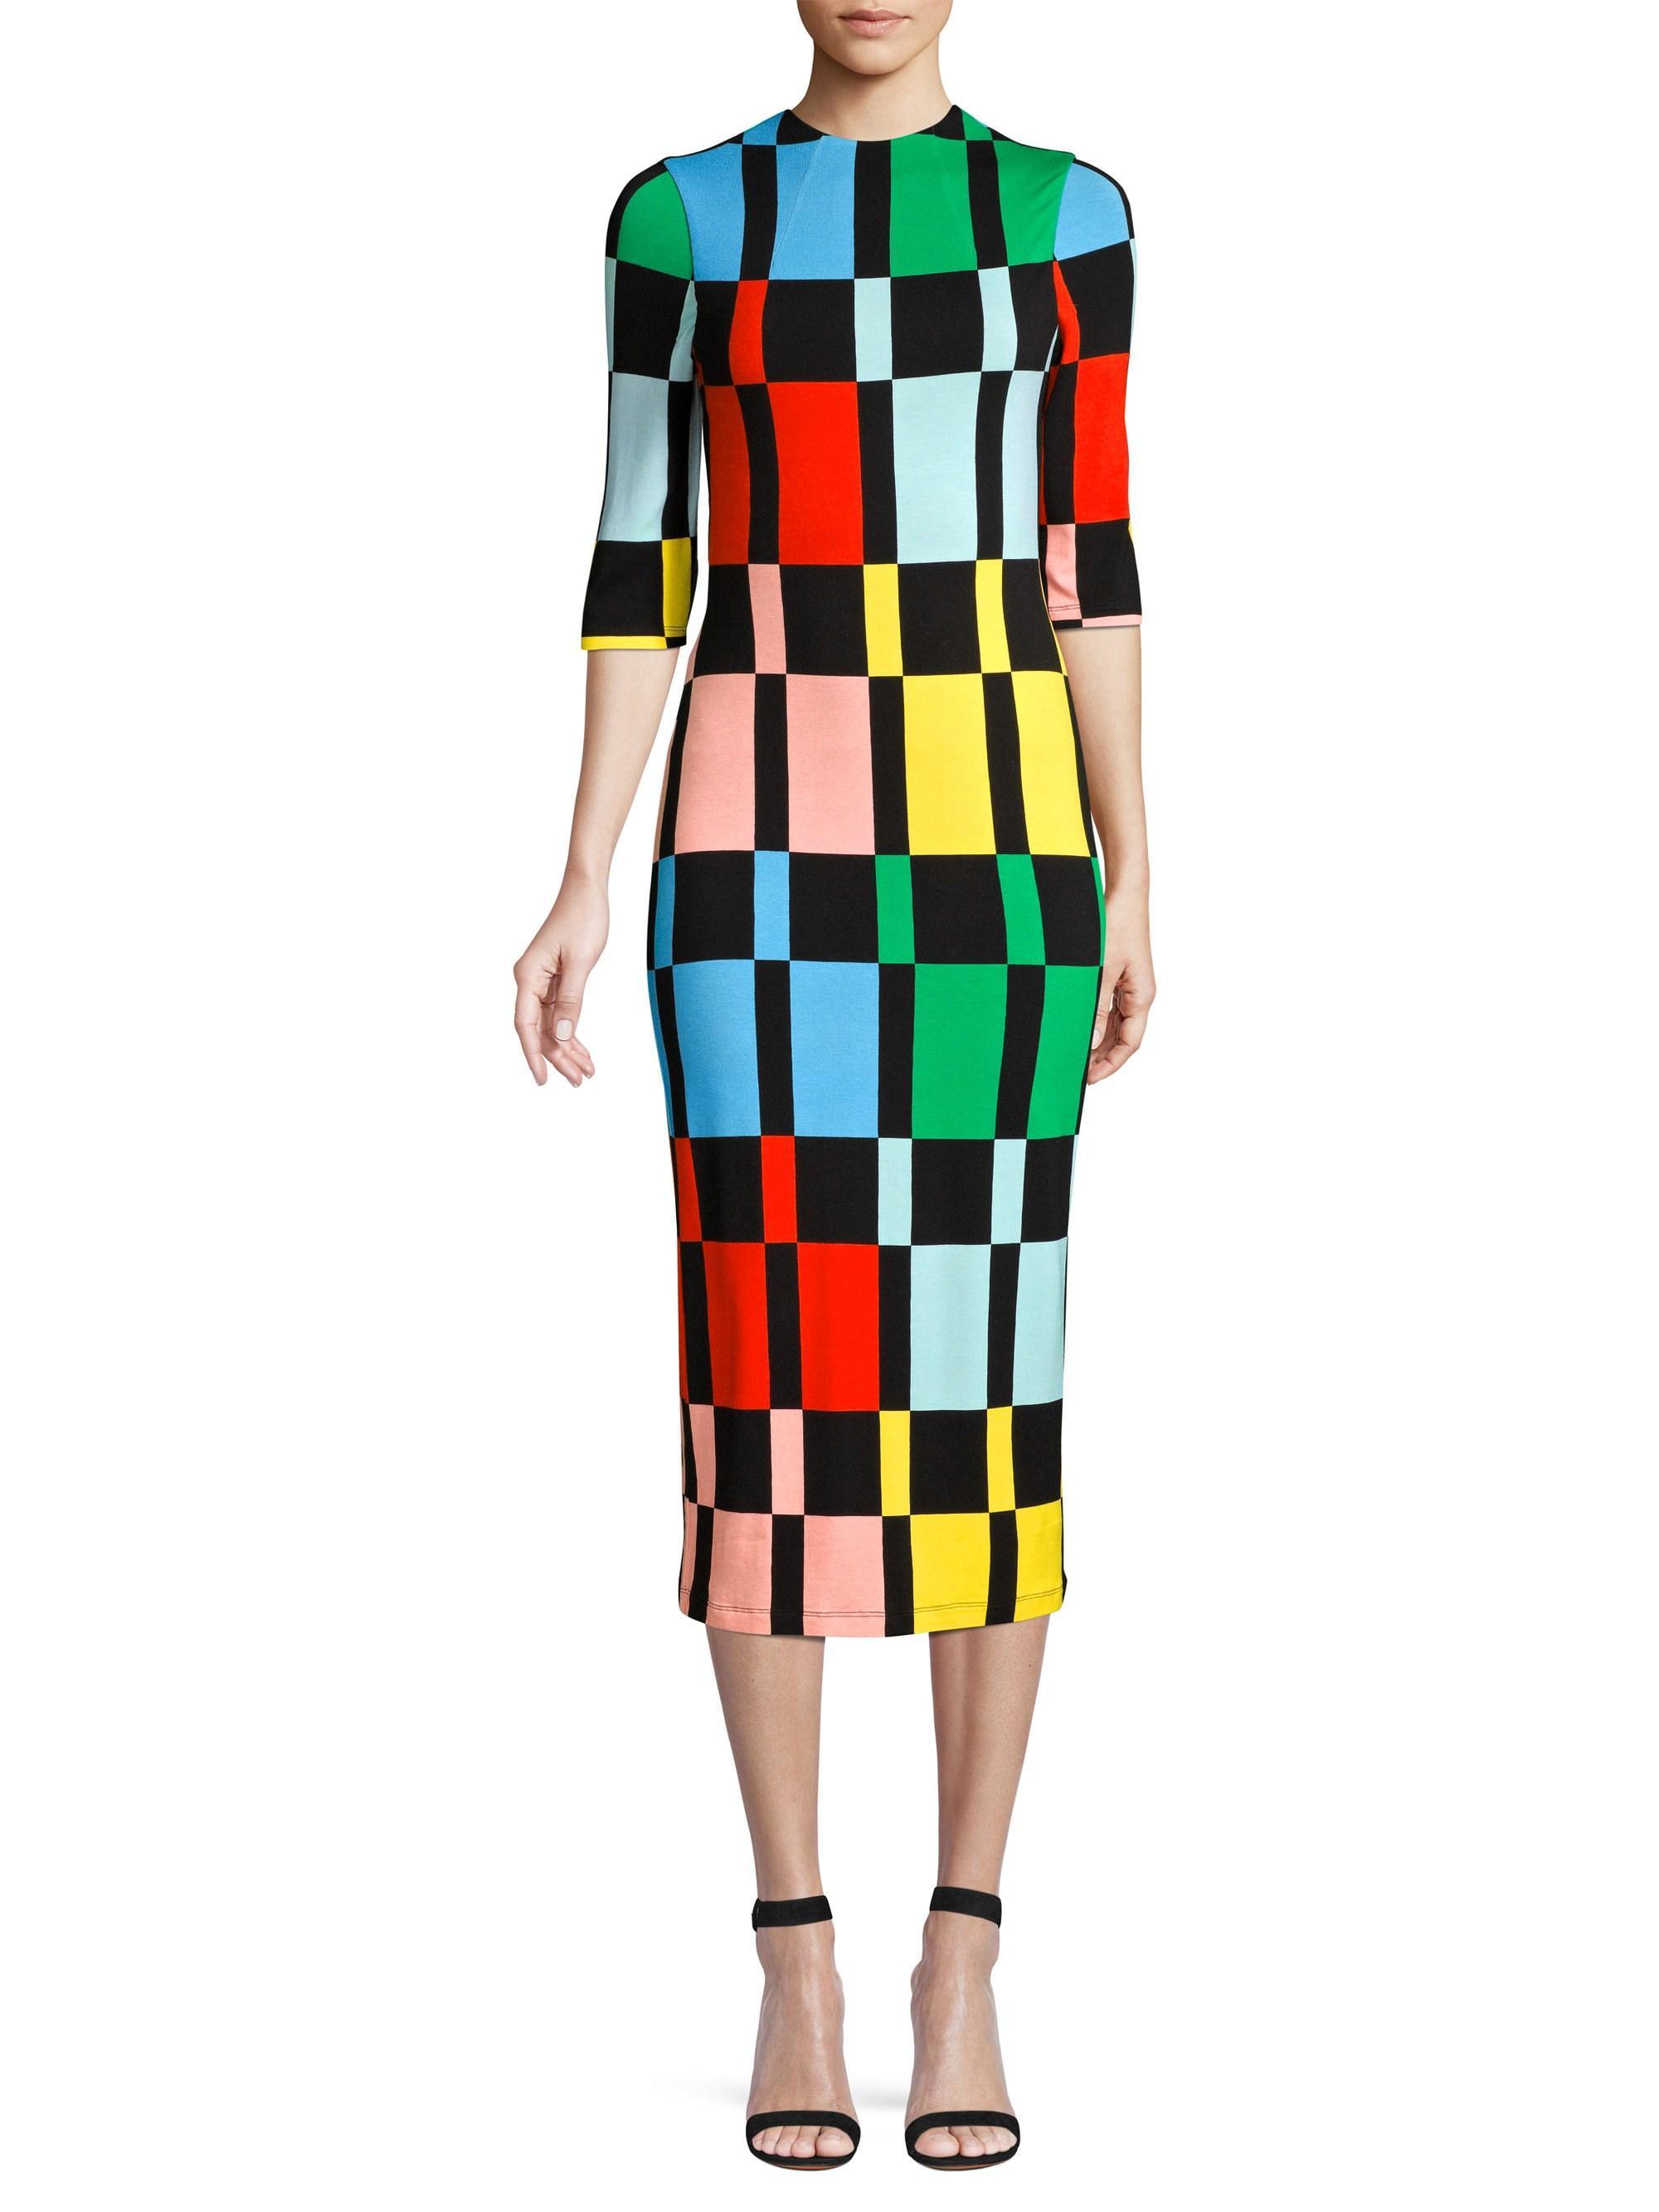 49510cf73 Alice + Olivia Women's Delora Knit Colorblock Sheath Dress ...